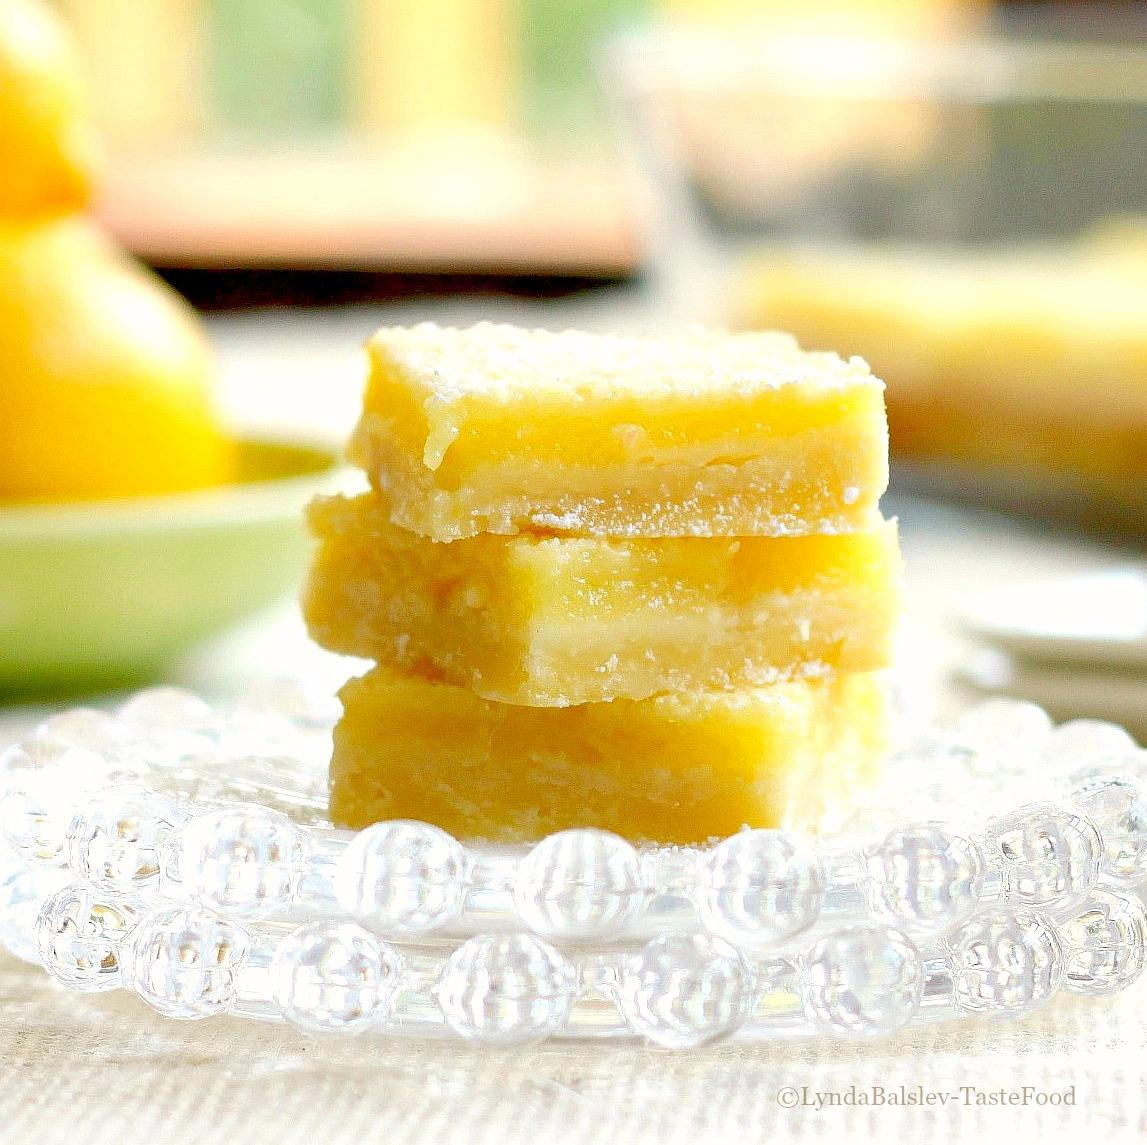 Baking favorites lemon shortbread bars tastefood for Food52 lemon bar